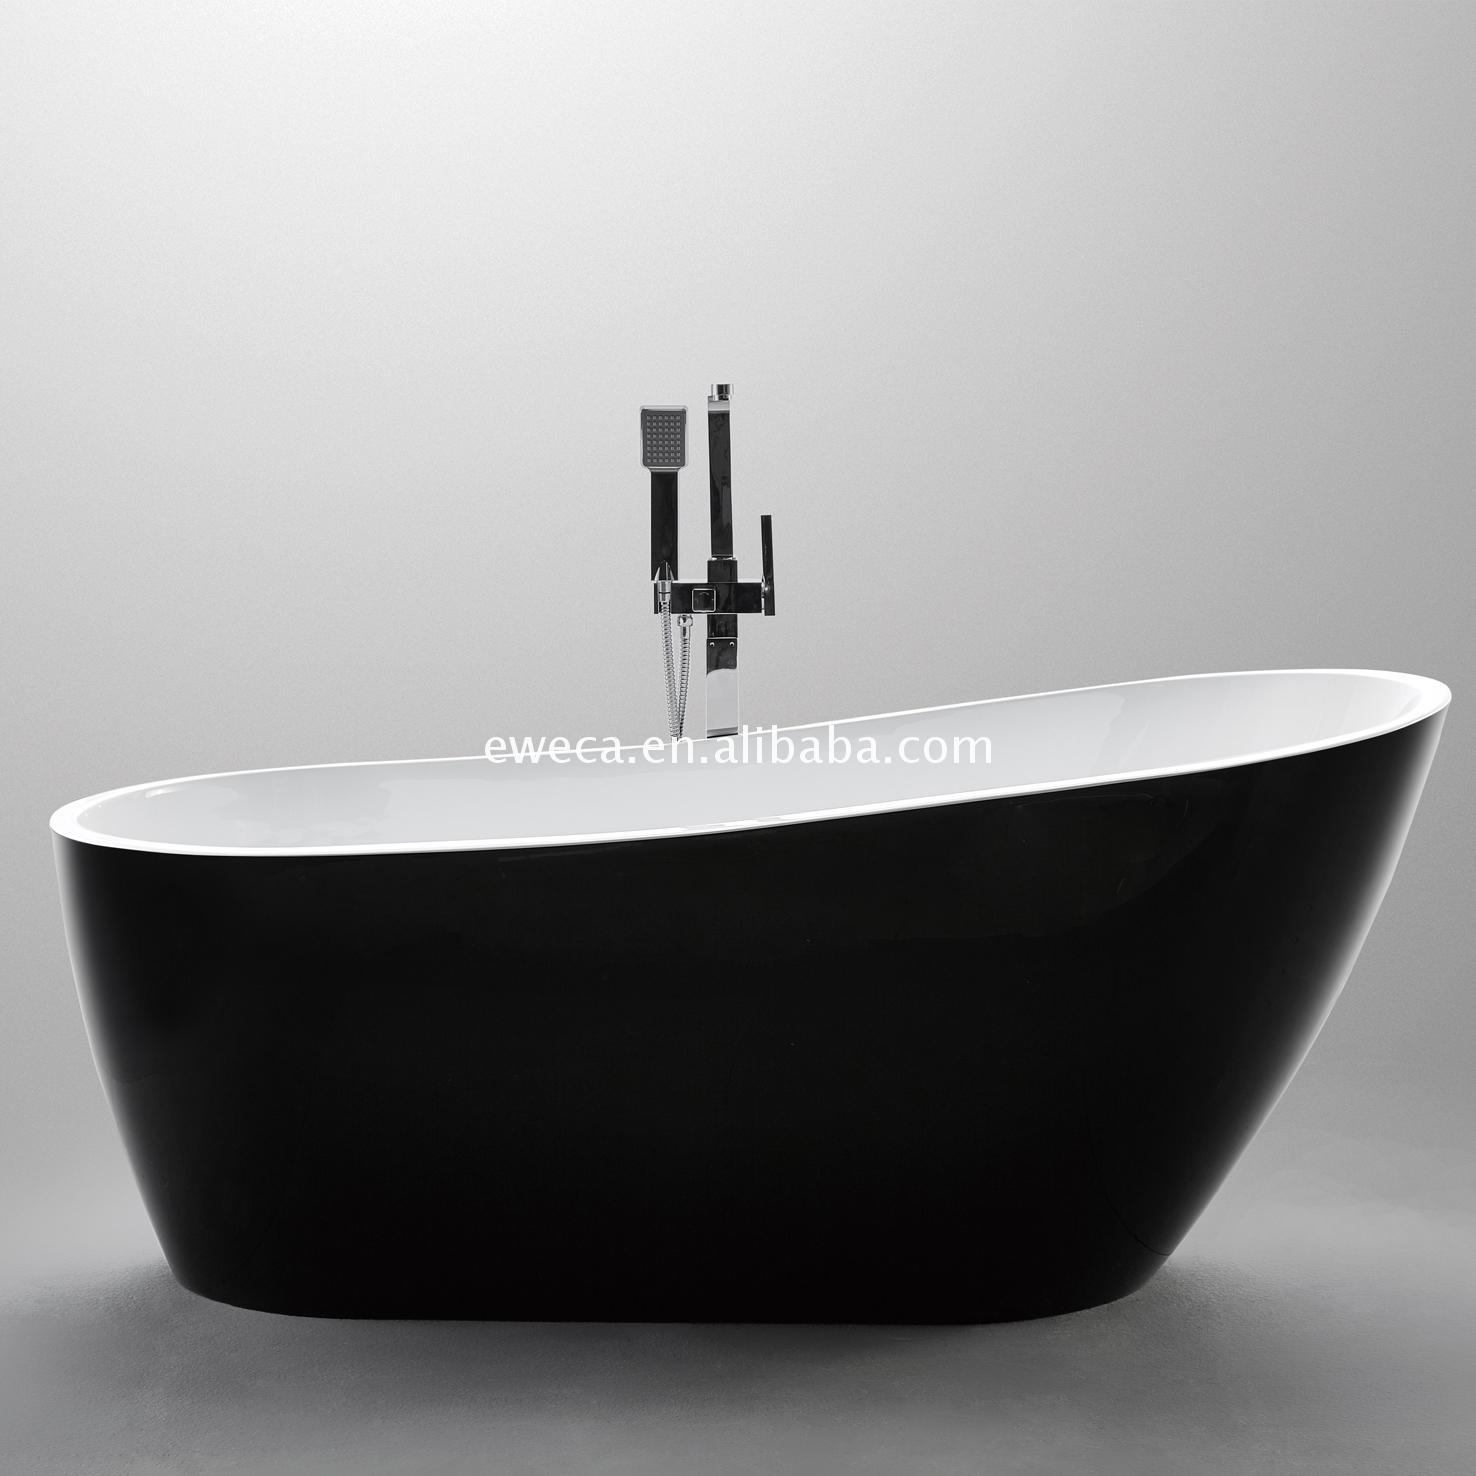 youtube bath to bathtub luxury shower kit full trends pleasurable astonishing bathroom drain new faucet cheap home nobby conversion decor convert tub design ideas